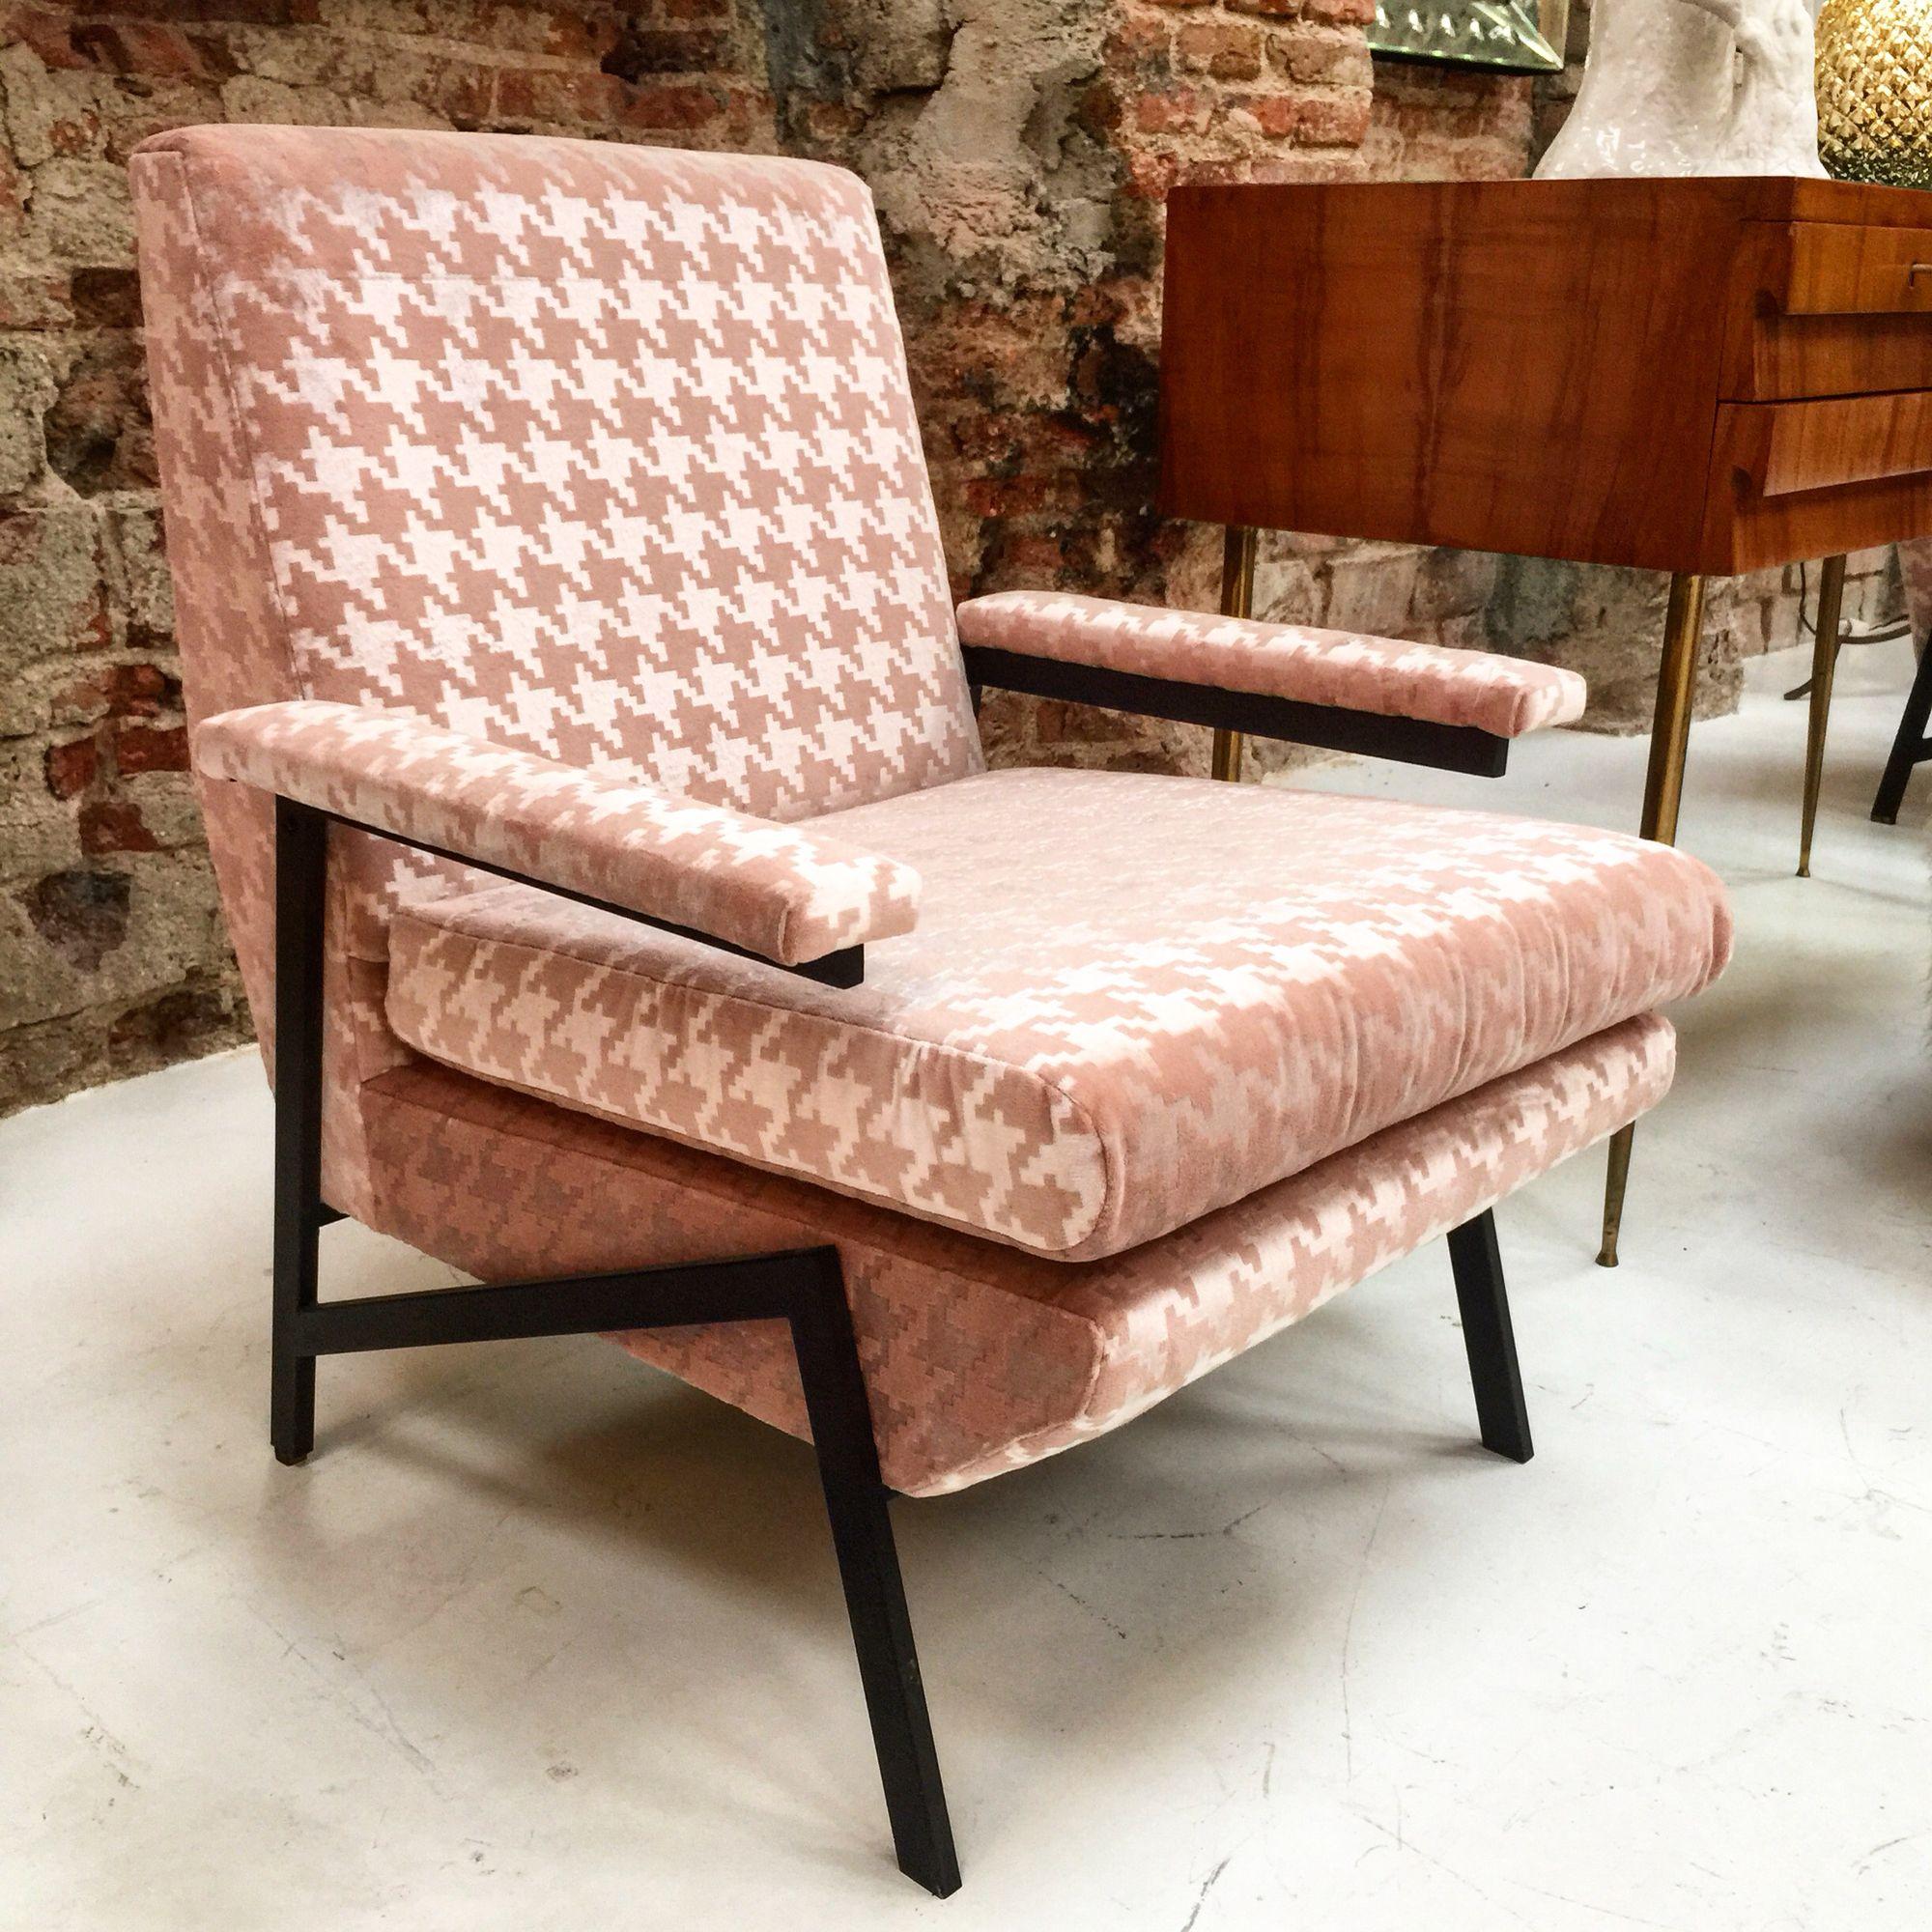 Heaven Furnishings, Chair, Home decor